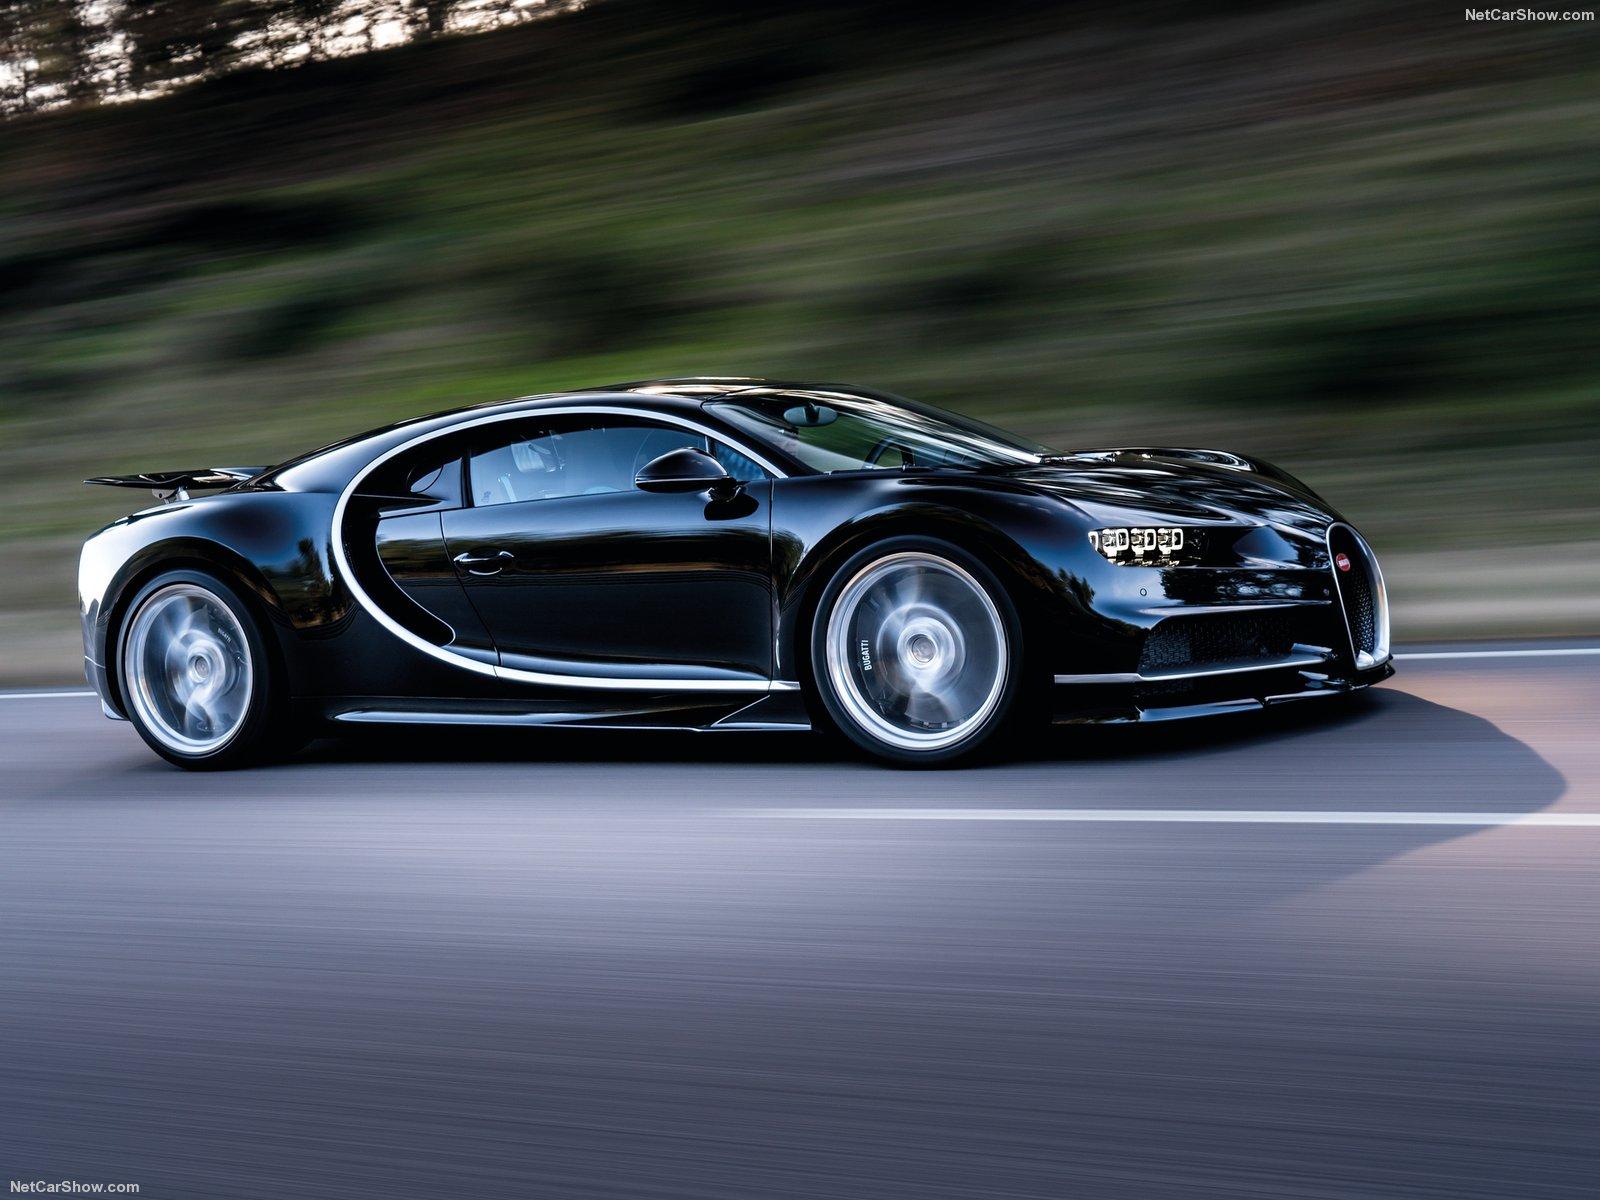 Bugatti-Chiron_2017_1600x1200_wallpaper_0d